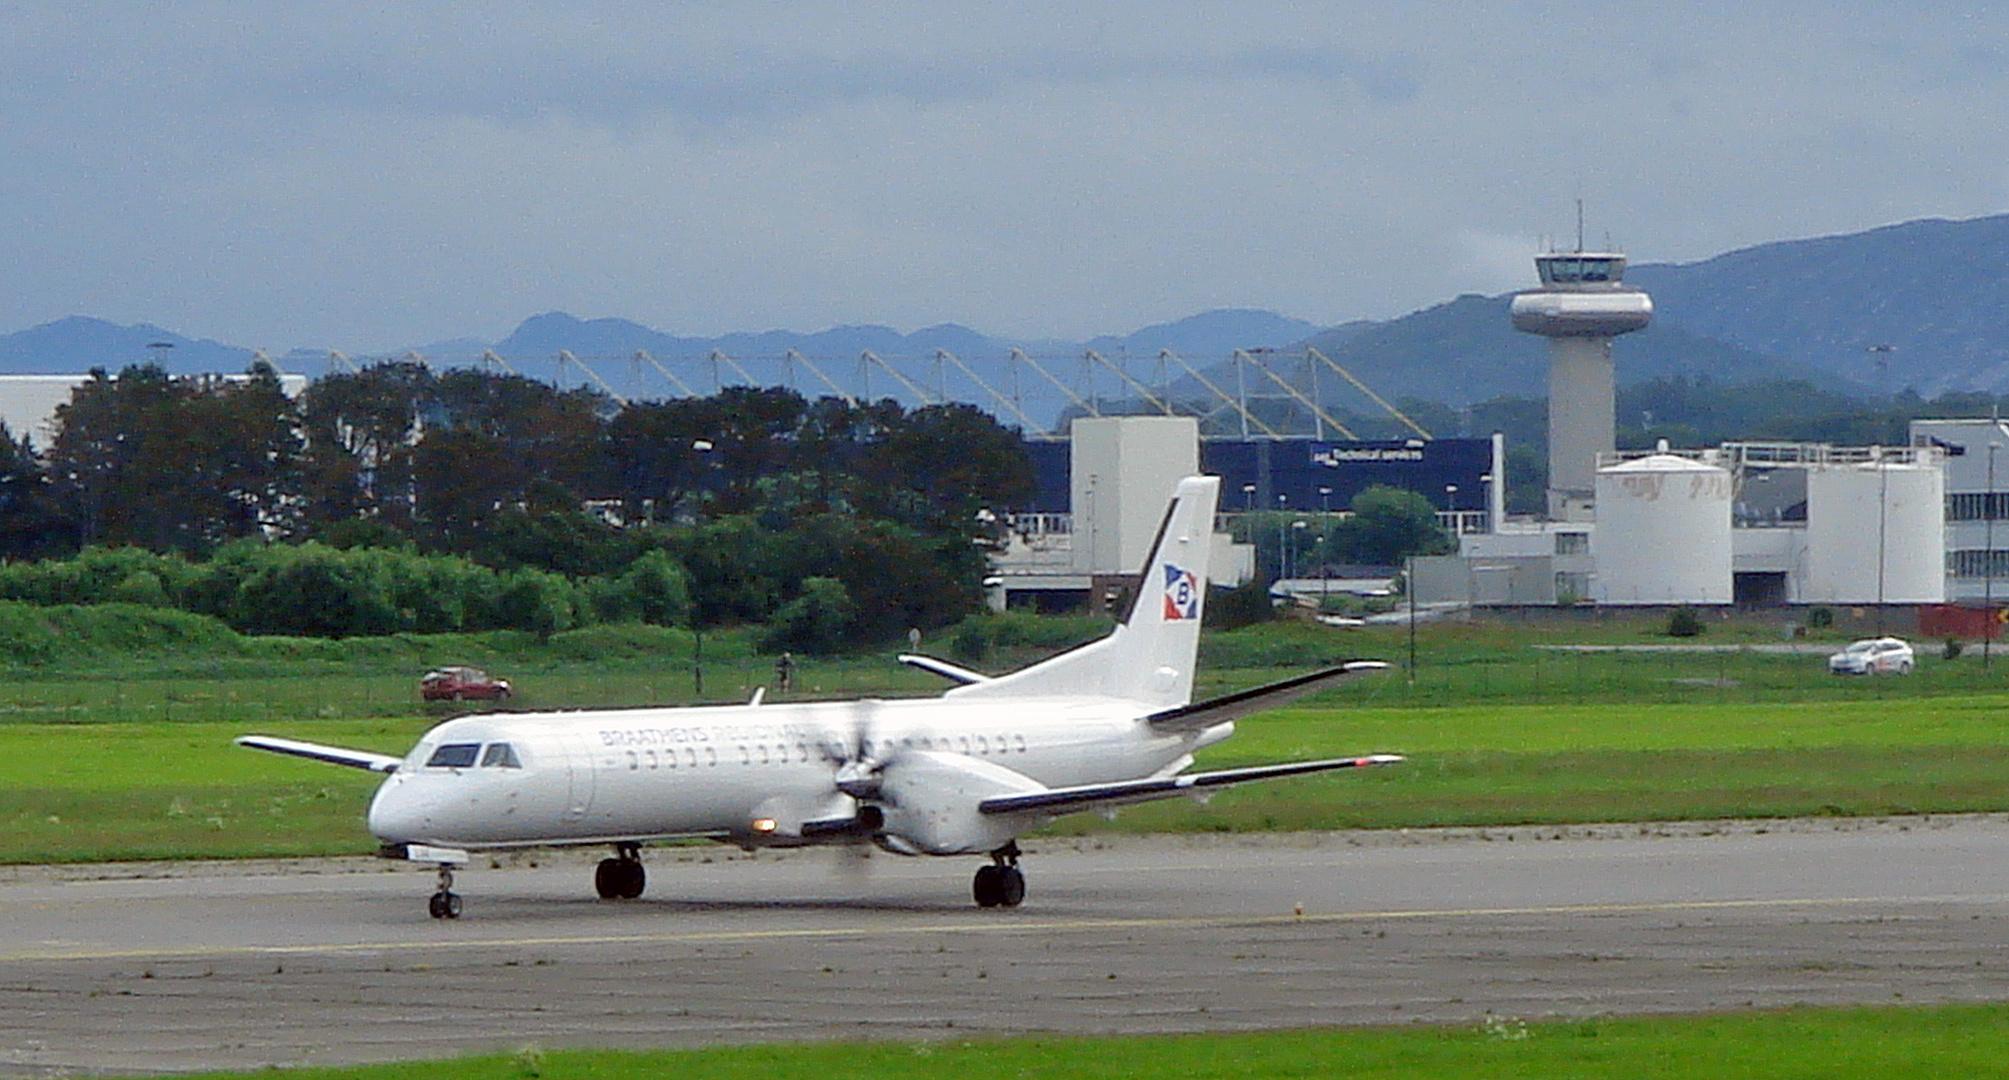 Stavanger International Airport / Sola